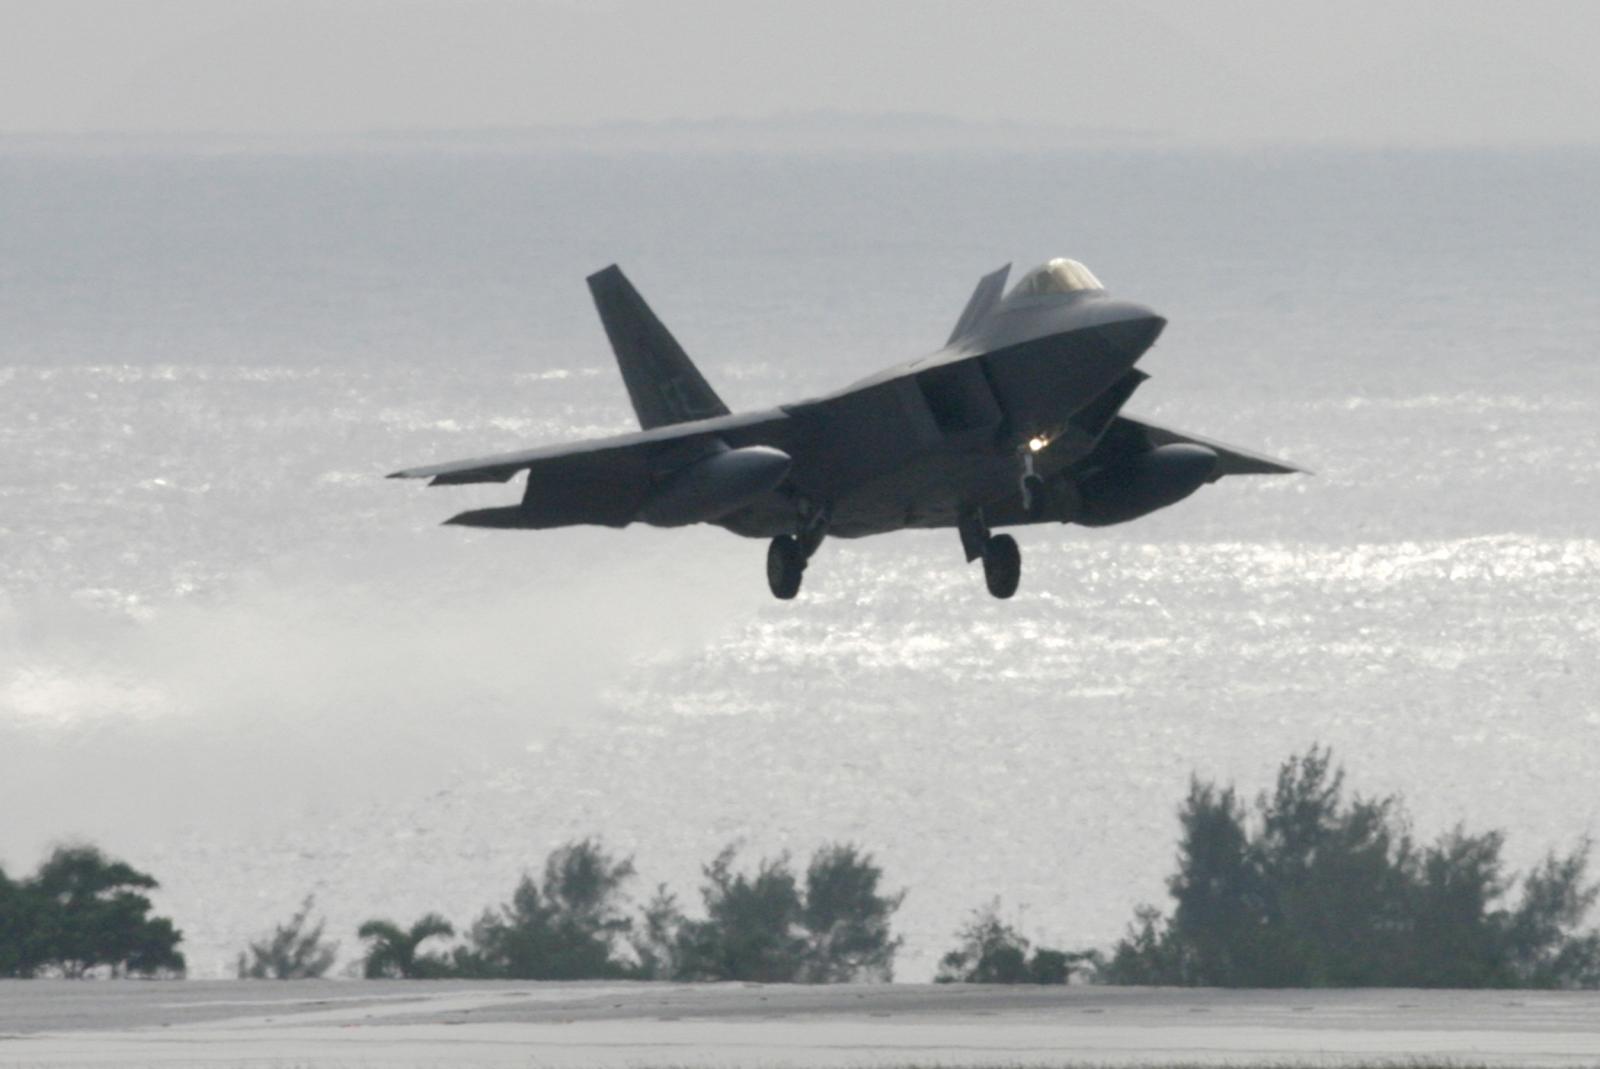 A U.S. Air Force F-22 Raptor